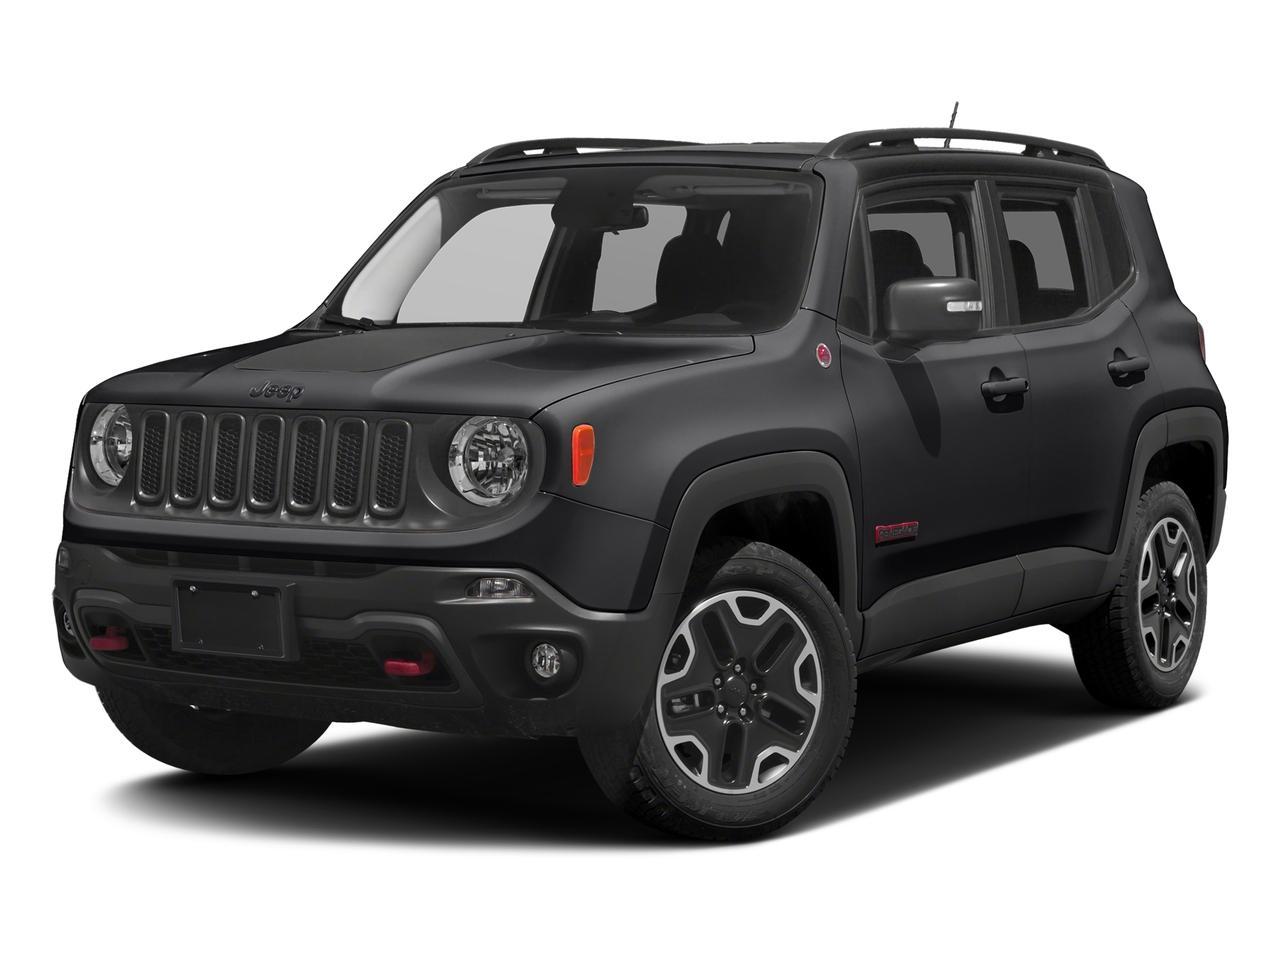 2016 Jeep Renegade Vehicle Photo in Austin, TX 78759